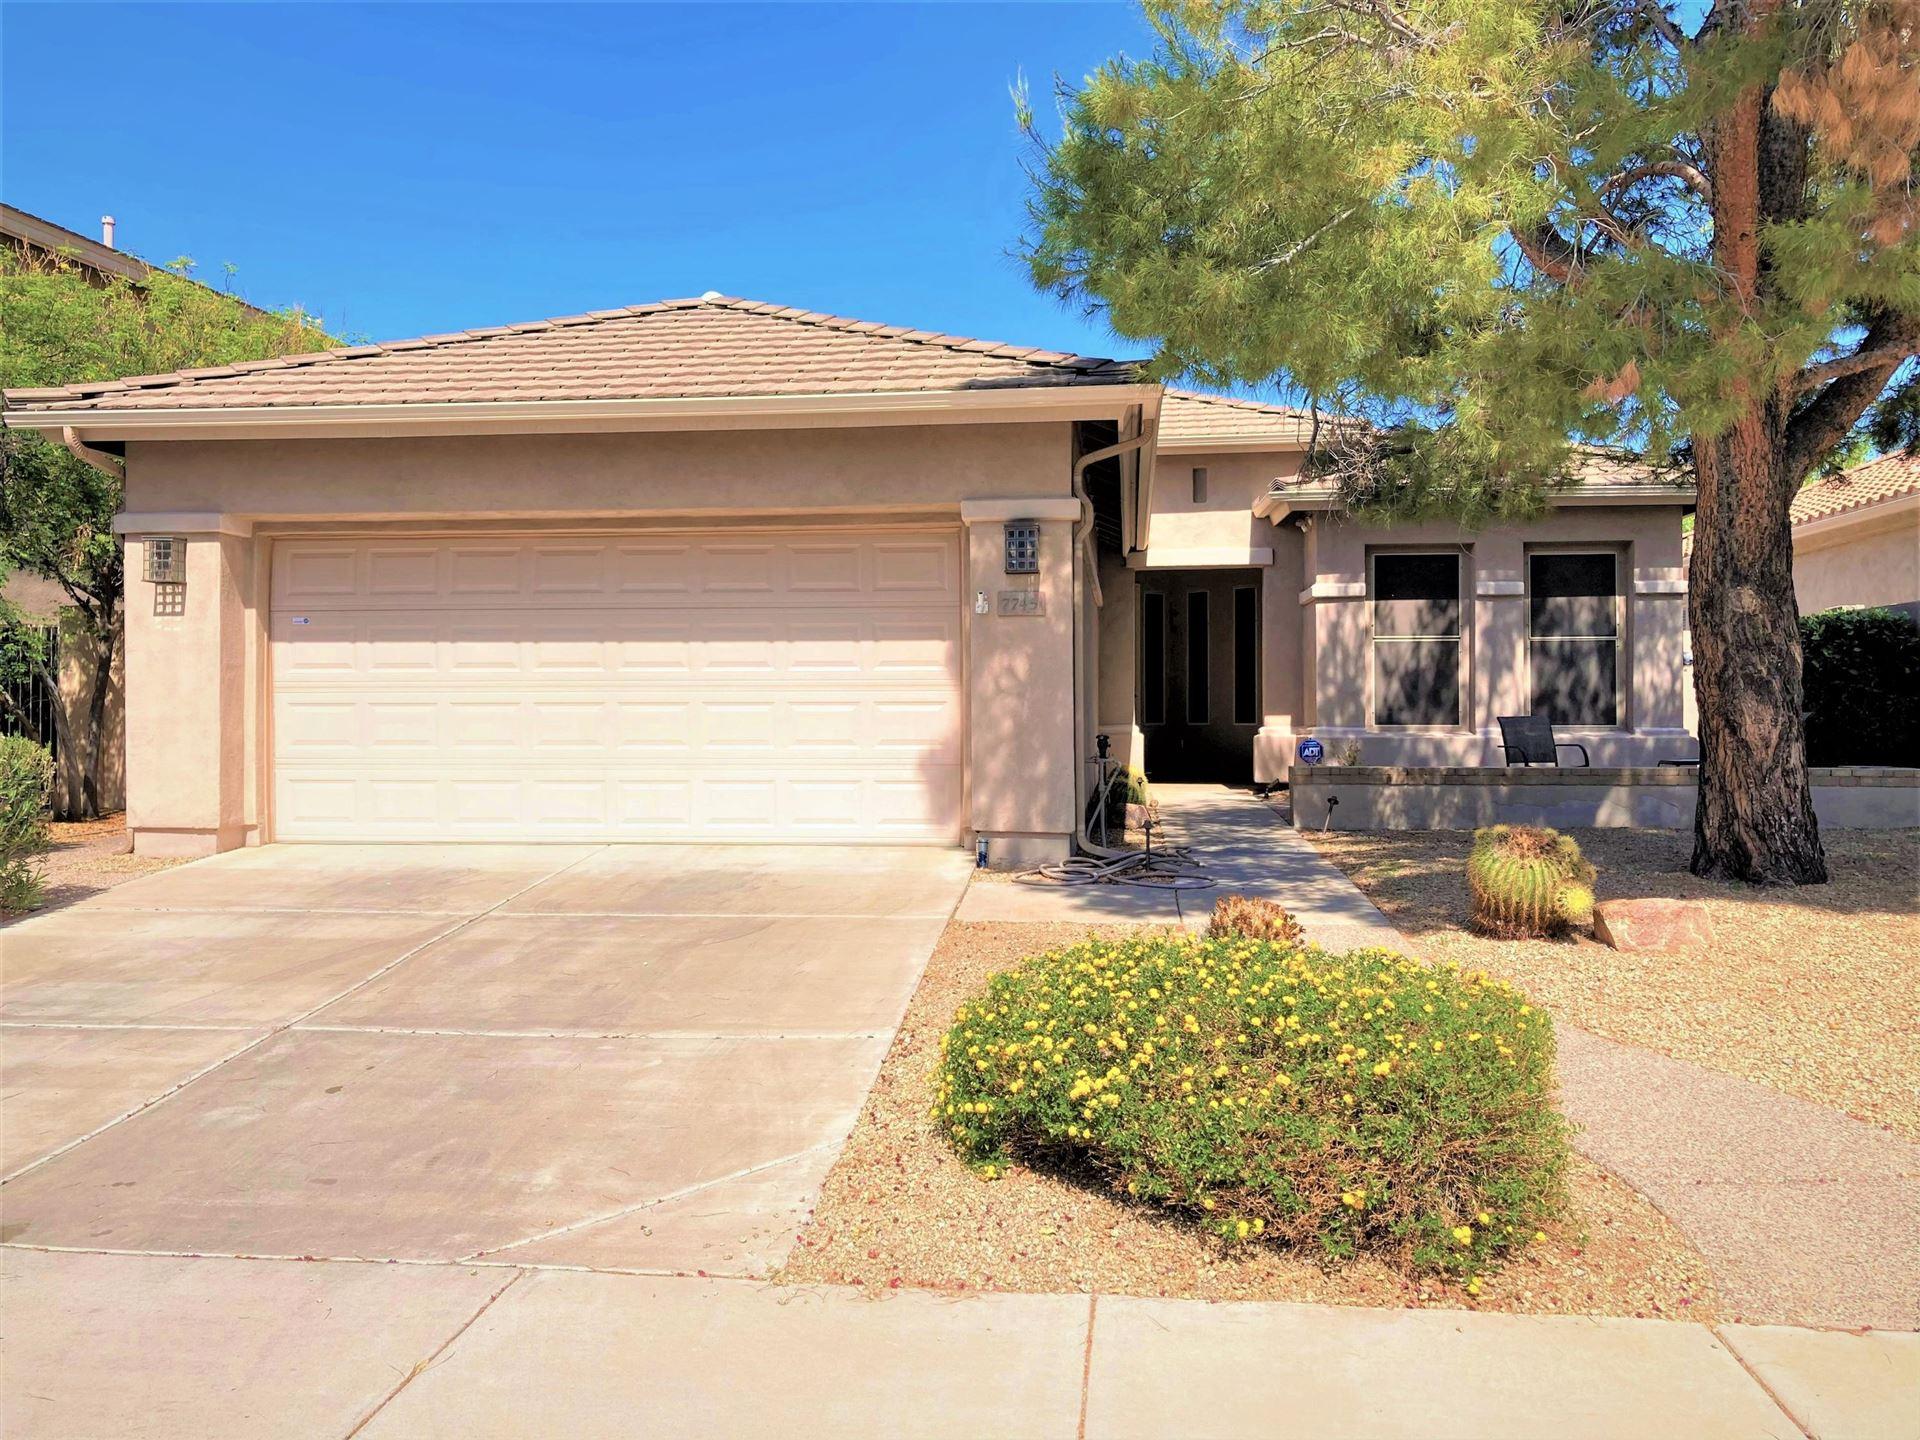 Photo of 7745 S McAllister Avenue, Tempe, AZ 85284 (MLS # 6234096)